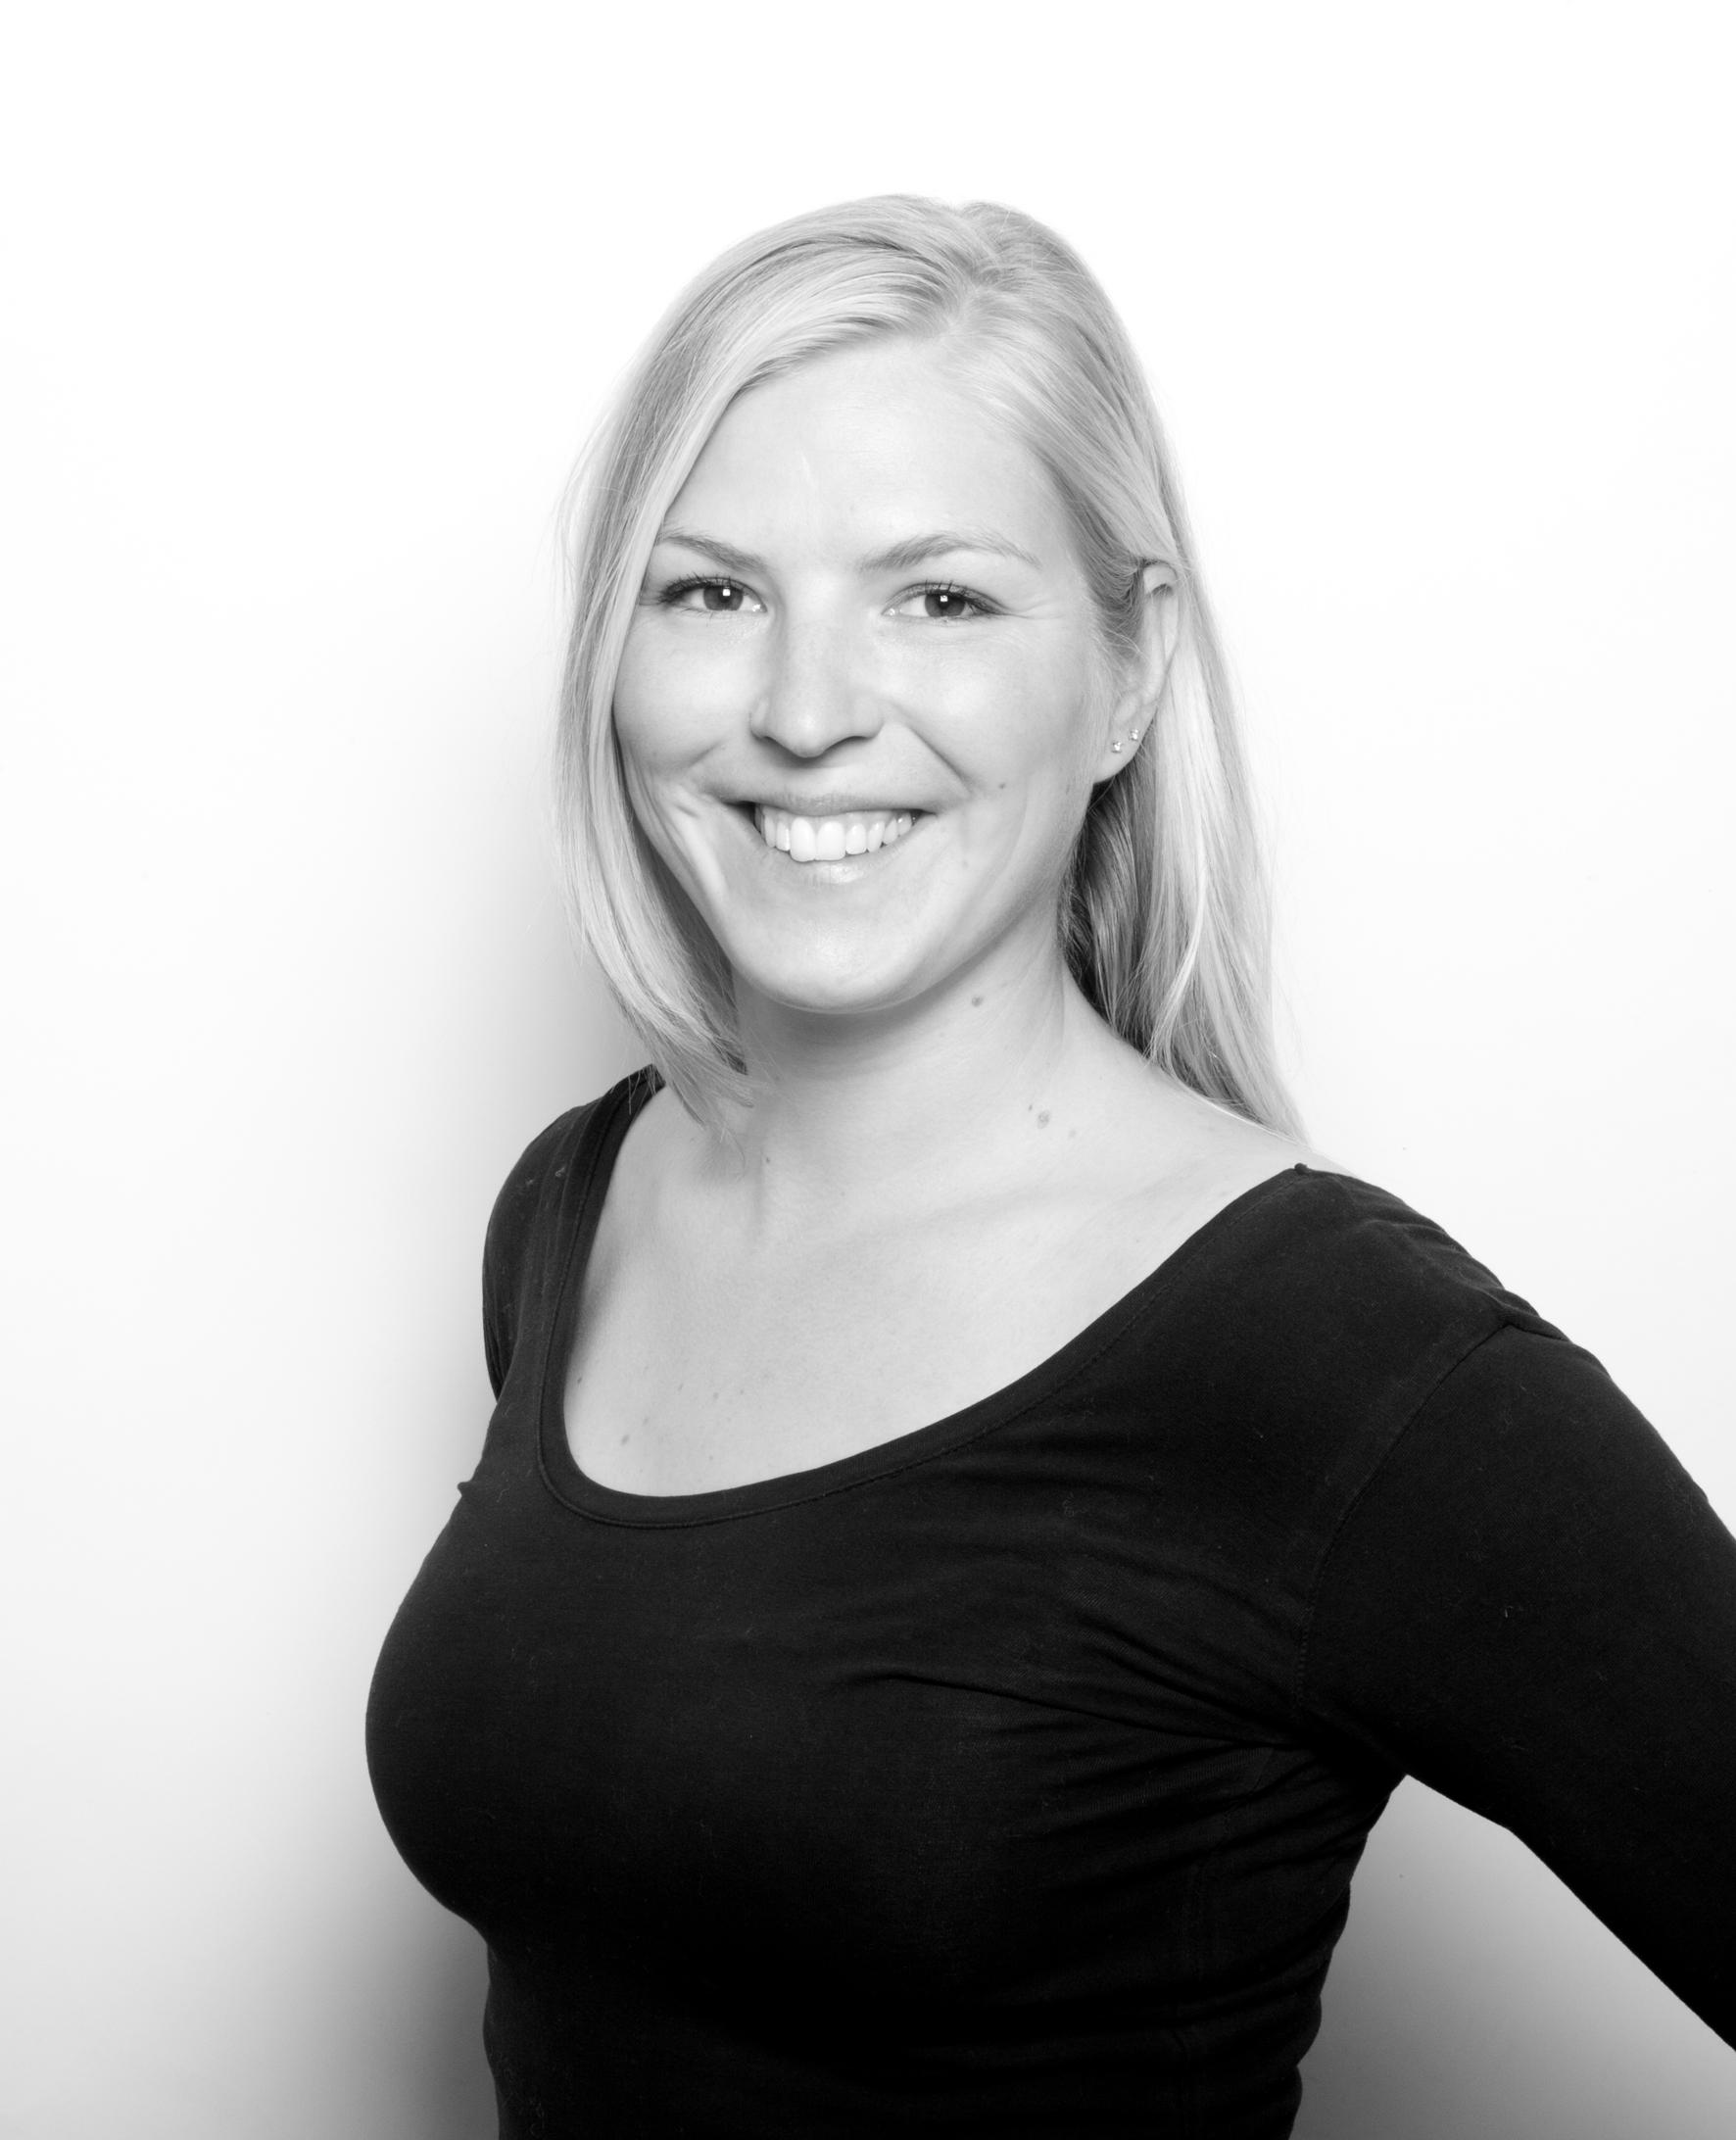 Nicoline Lund Gundtoft, projektleder